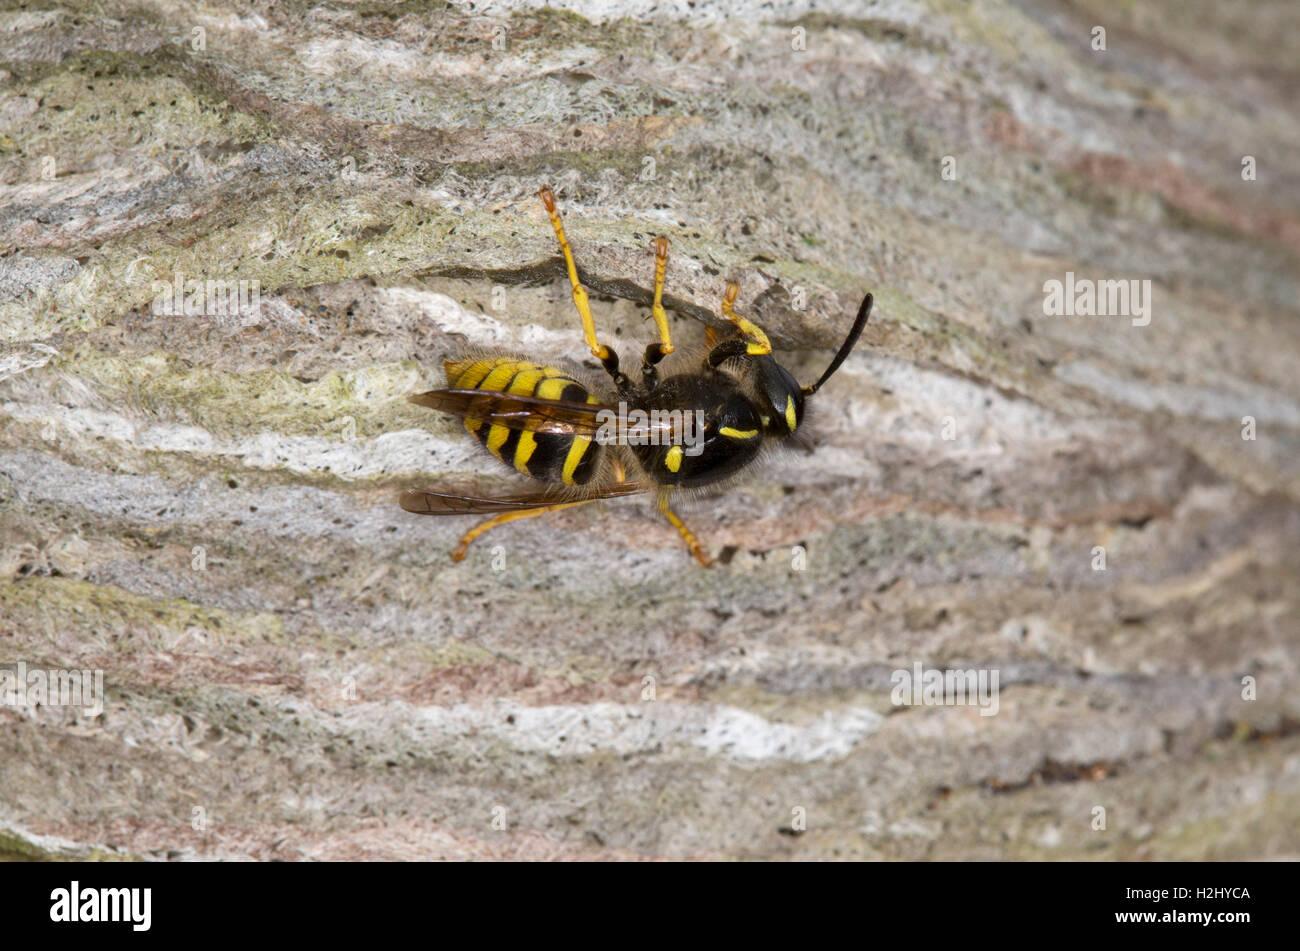 Common Wasp, Vespula vulgaris, single adult worker building nest, Worcestershire, UK. - Stock Image